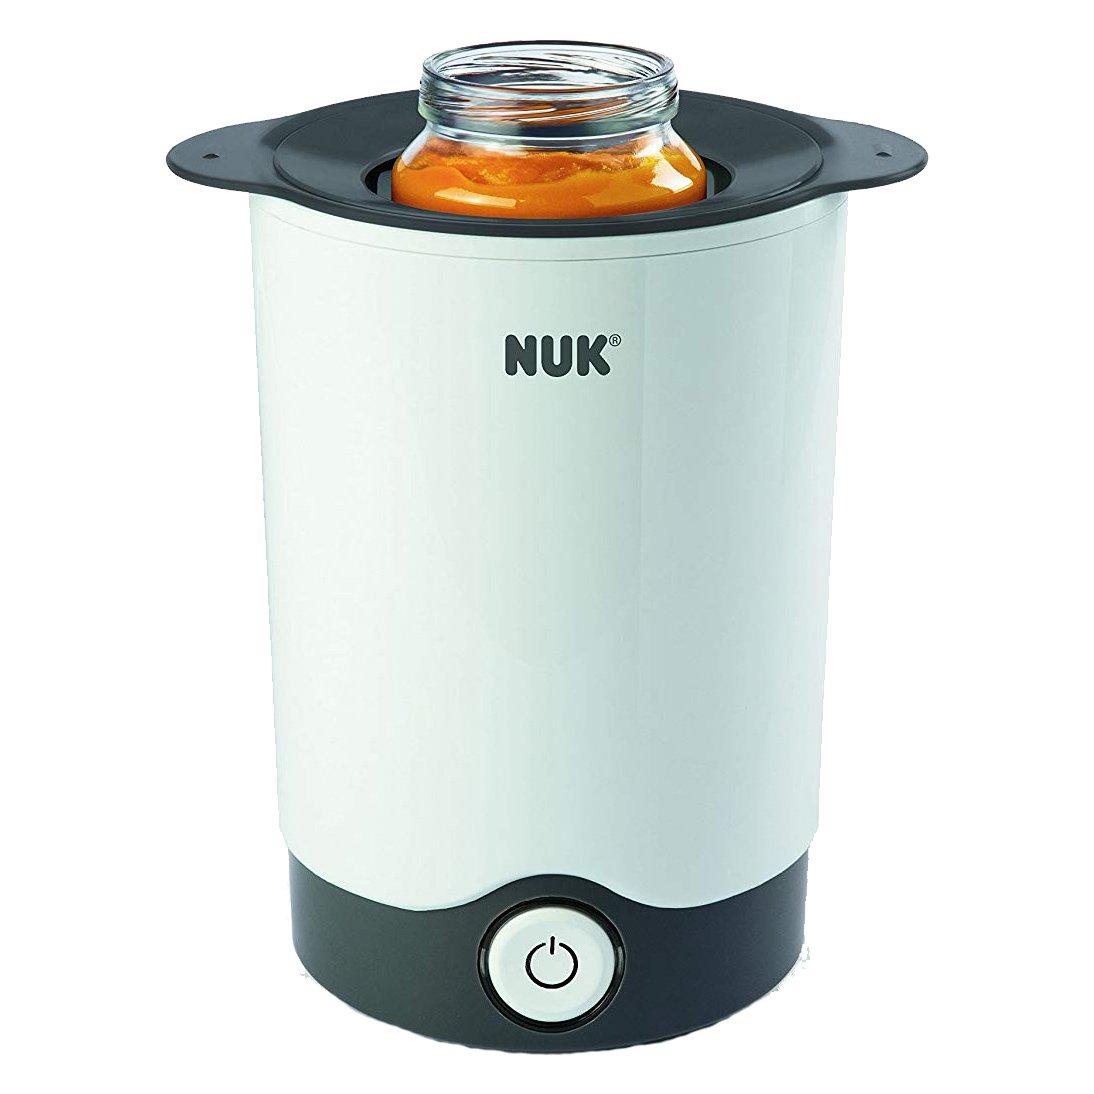 Nuk Thermo Express Θερμαντήρας Μπιμπερό Κατάλληλος για ΒρεφικέςΤροφές